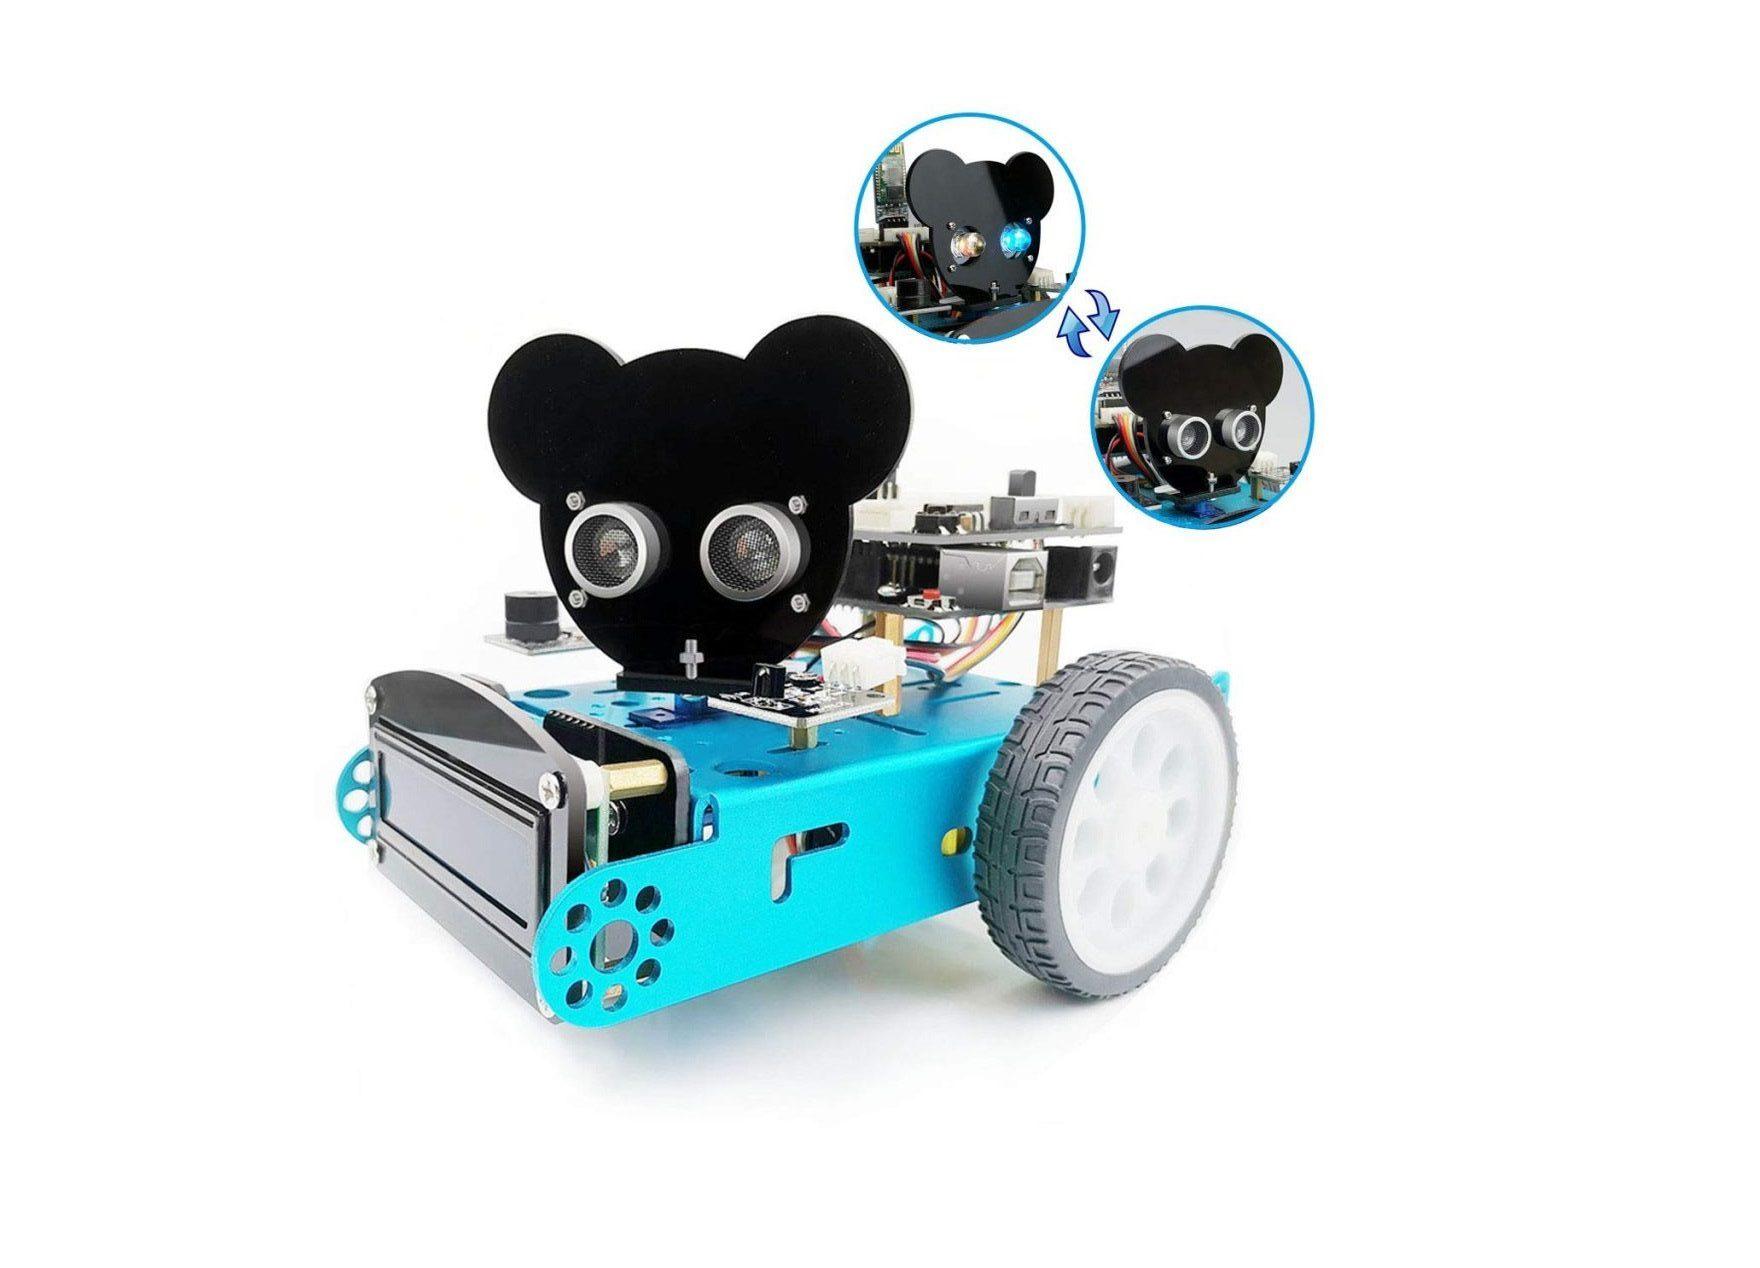 CKK0002 Smart Robot Car